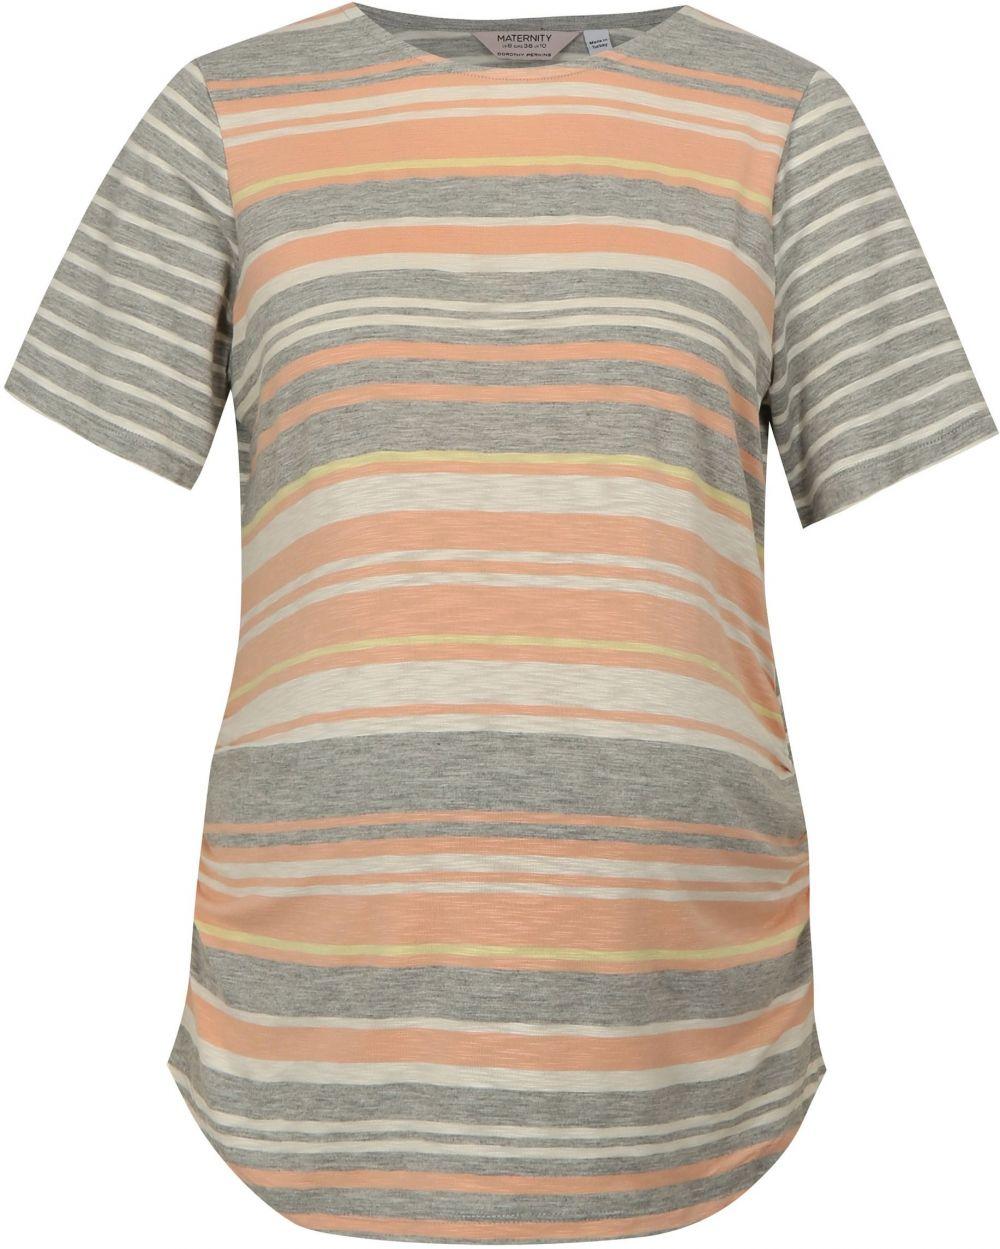 2bebfc14b4d0 Marhuľovo–sivé pruhované tehotenské tričko Dorothy Perkins Maternity ...